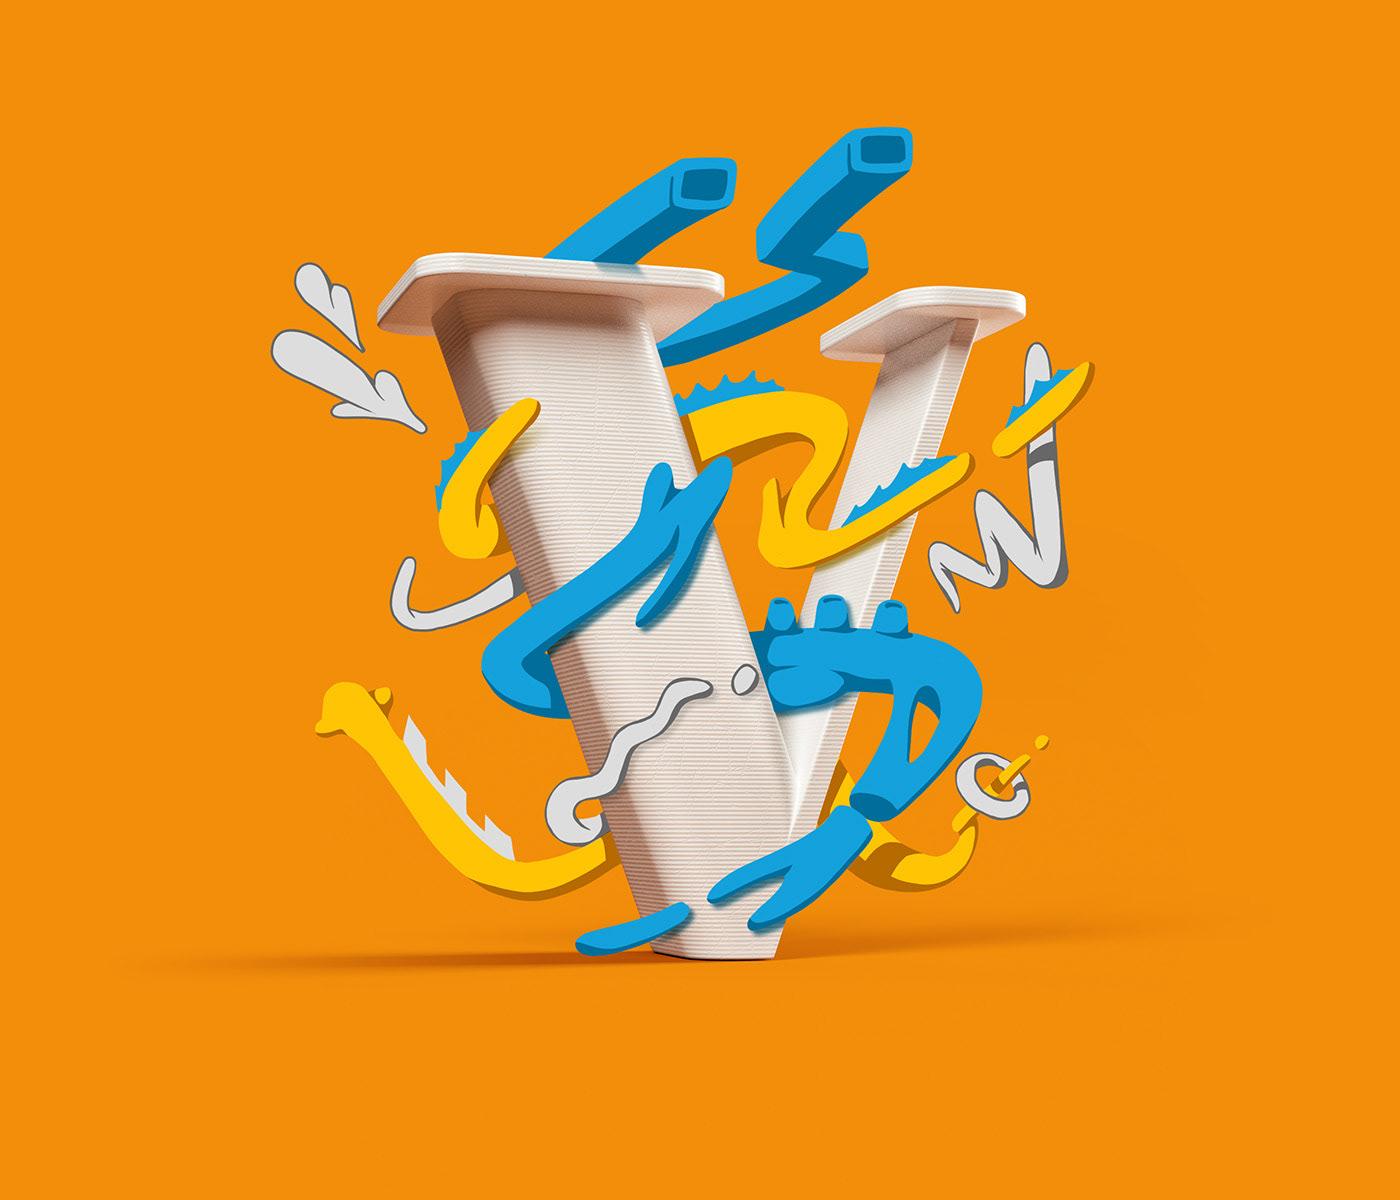 alphabet 3d-lettering mixed media cartoon comic 3D typography 3D 2D Letter 3D lettering cel shading